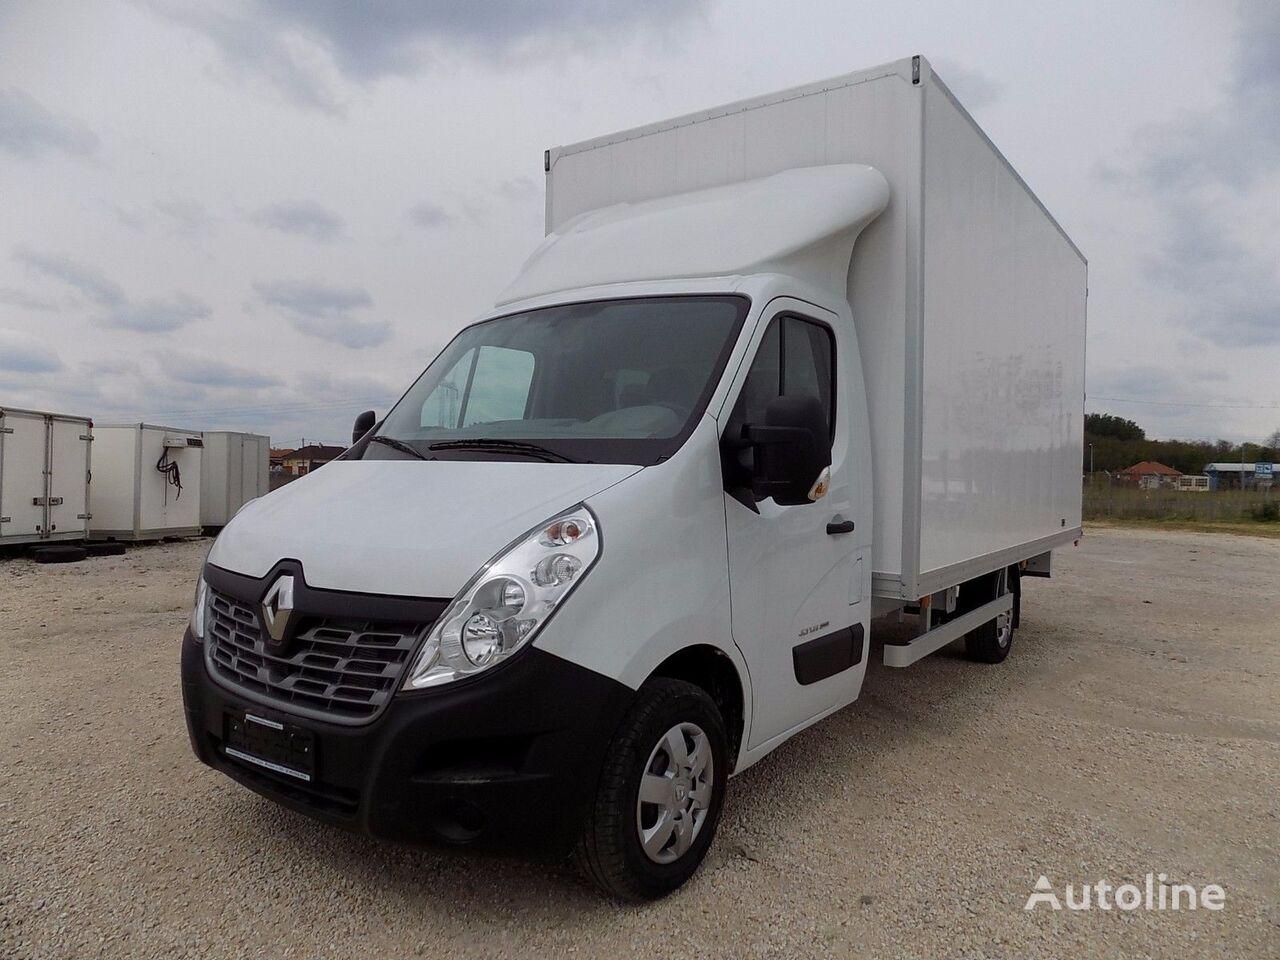 novi minibus furgon VOLKSWAGEN Crafter XLH2, 15,6m3, 136Ps